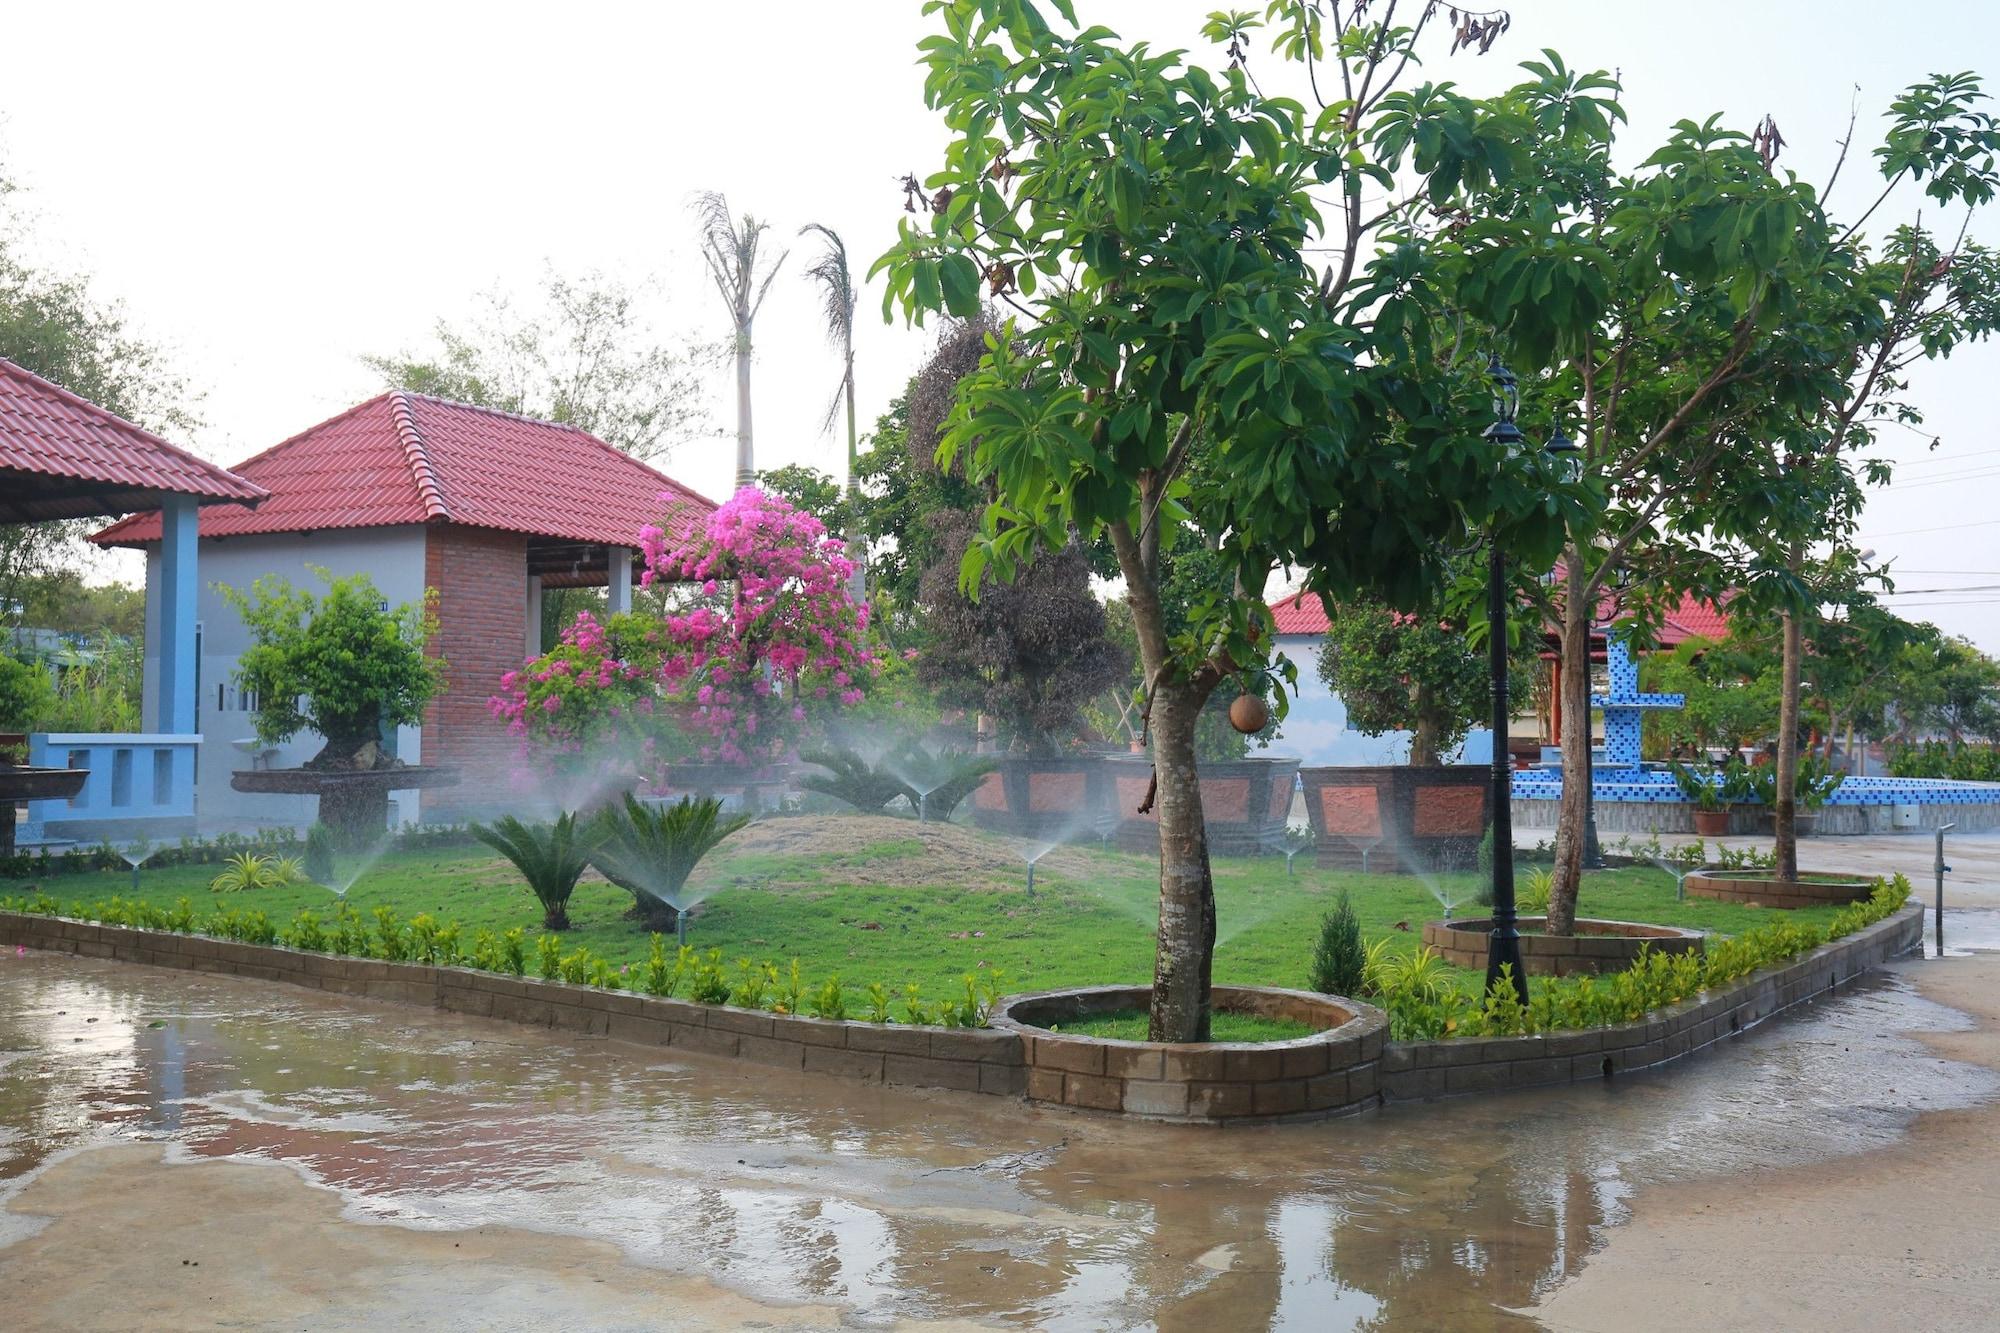 Ven Song Riverside Hotel, Xuyên Mộc